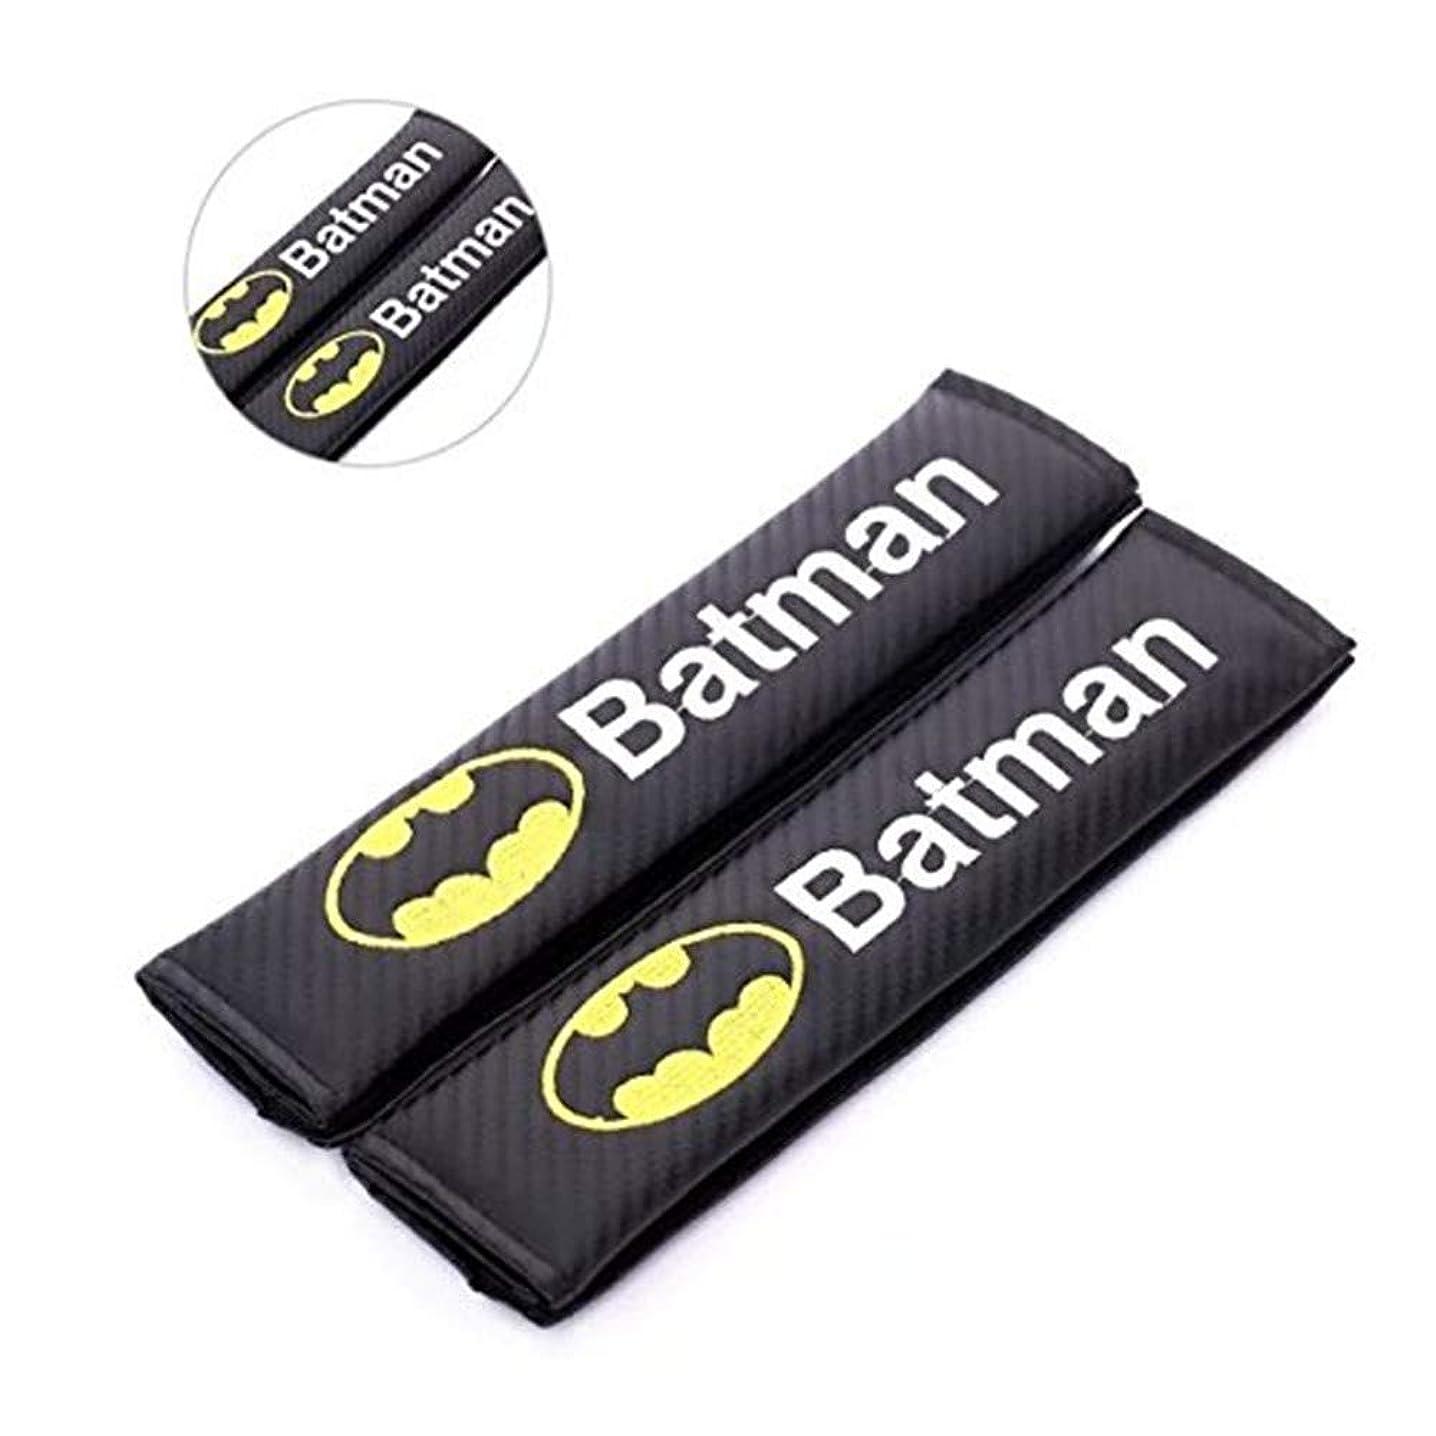 Altopcar Seat Belt Cover, Carbon Fiber Seat Belt Strap Cover for Any Car-Black with Batman Logo(Shoulder Strap) 2pcs